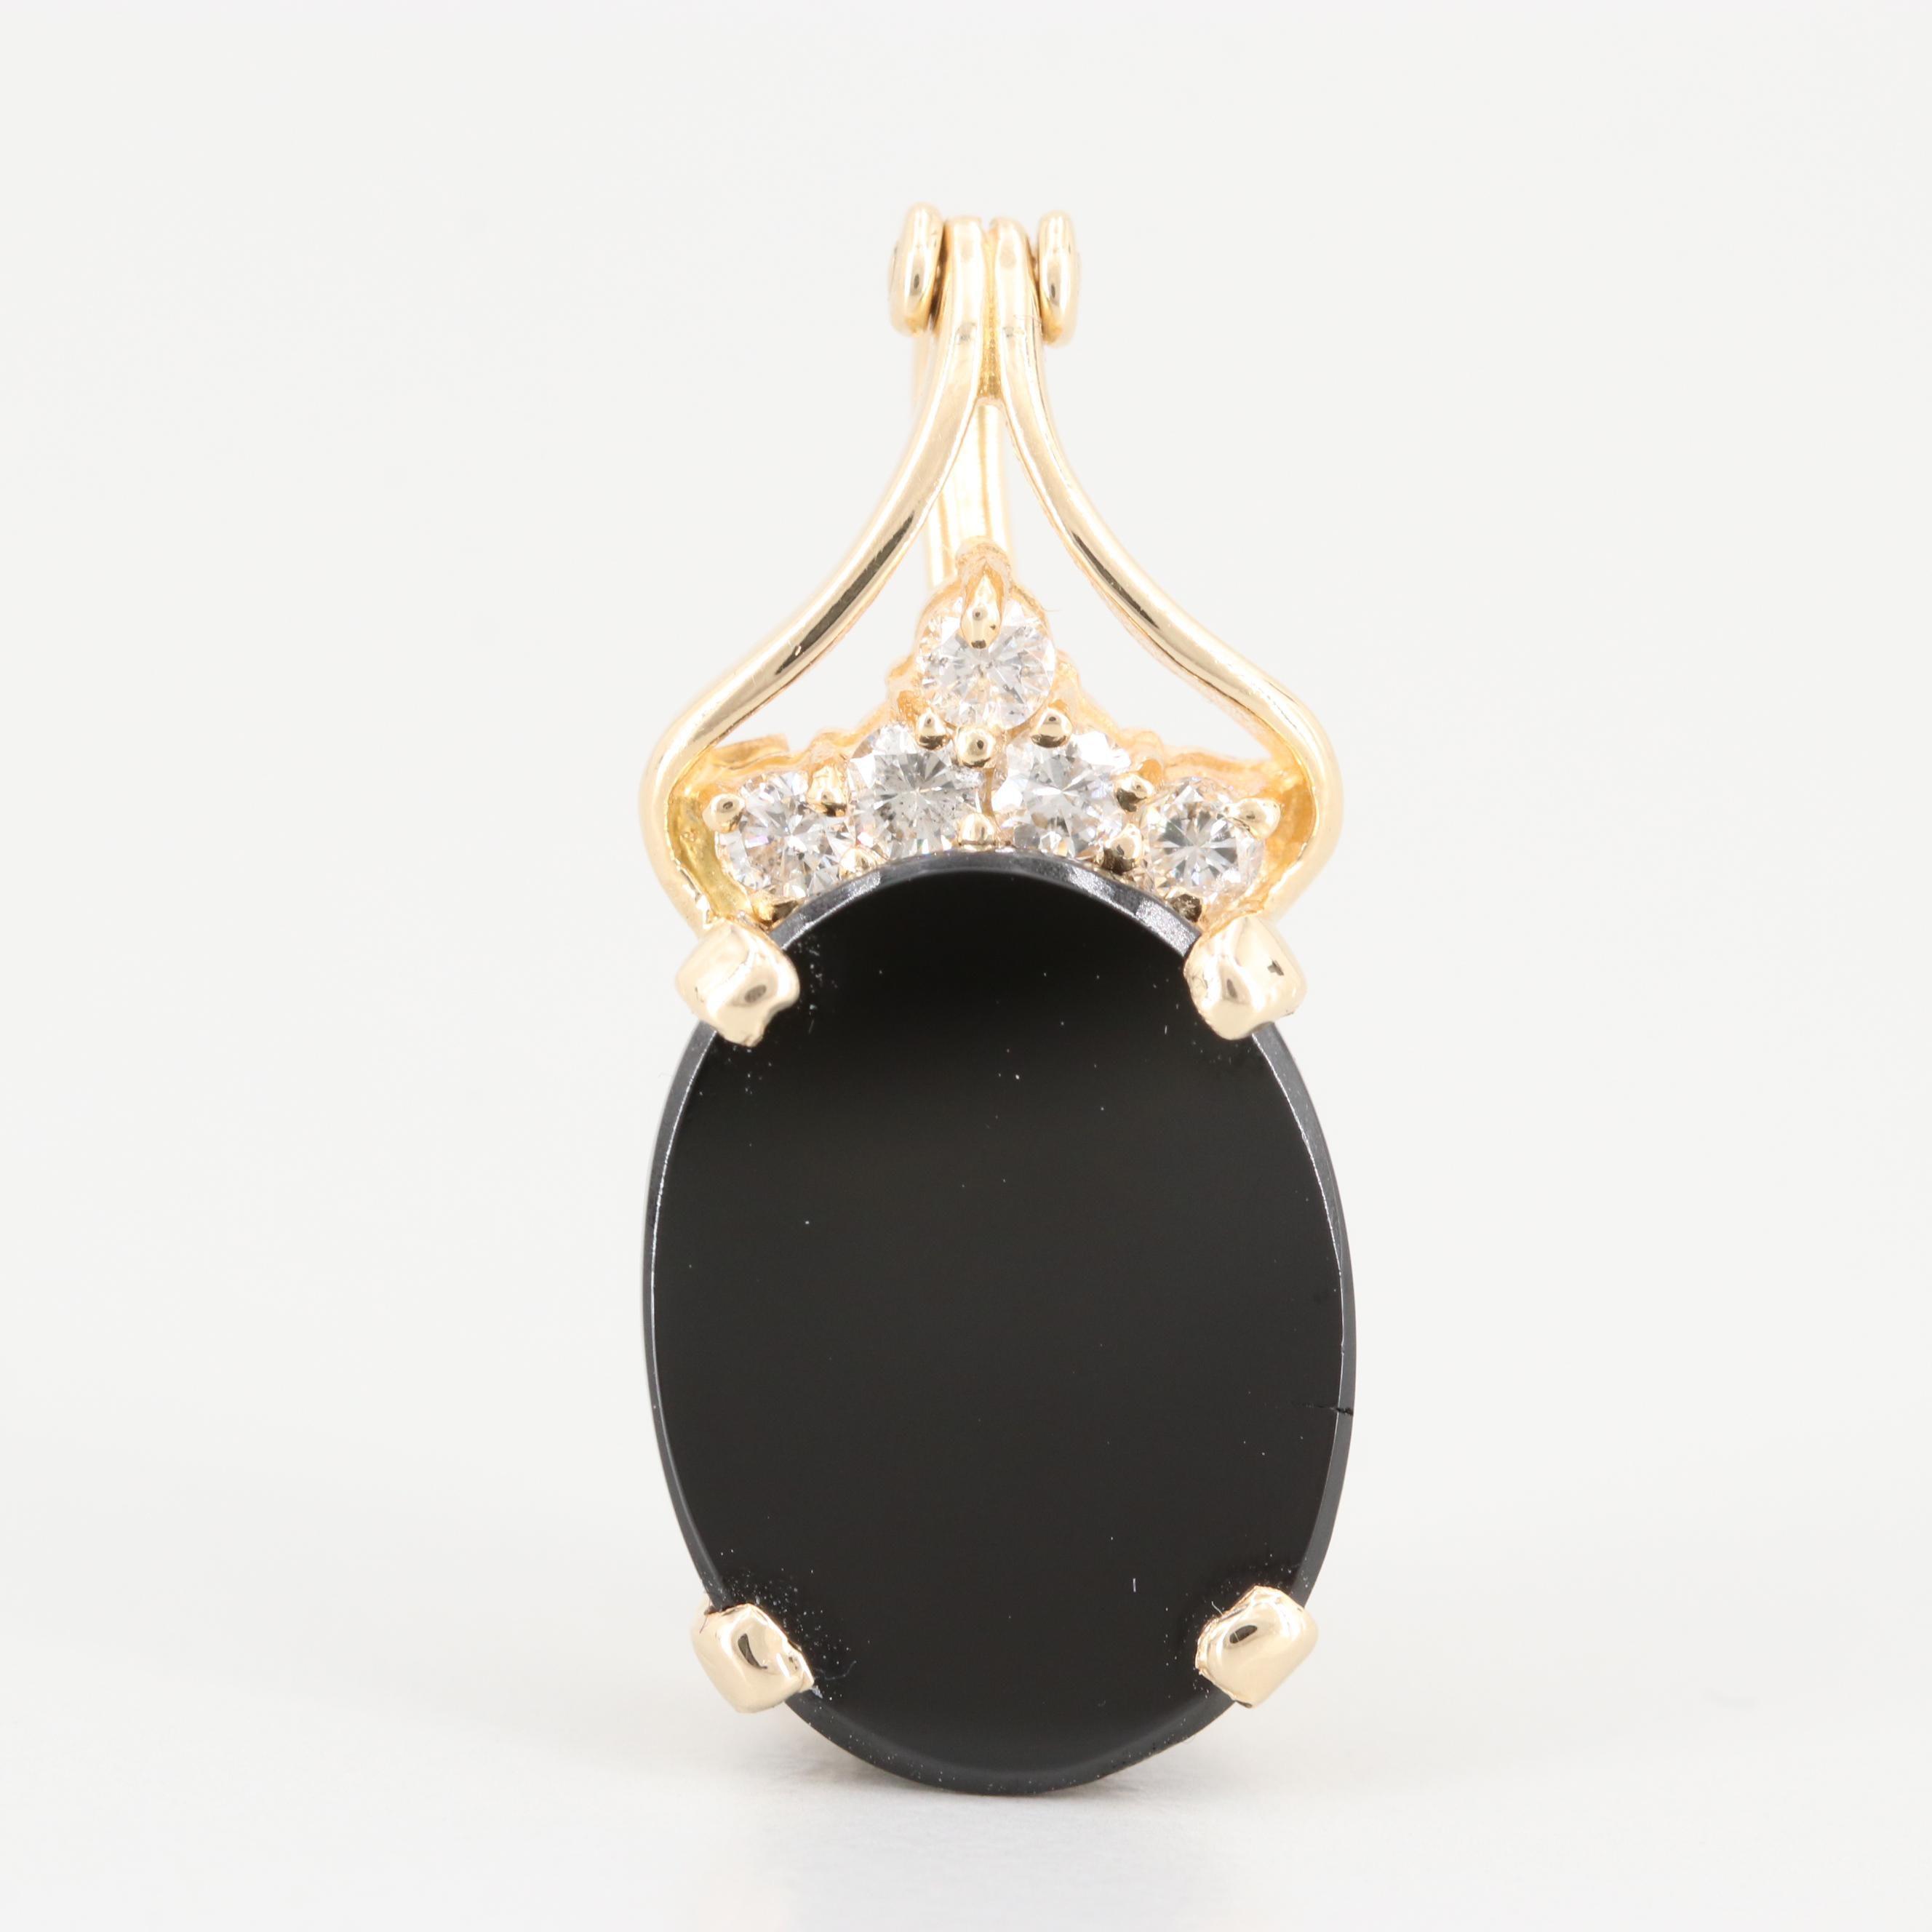 14K Yellow Gold Black Onyx and Diamond Enhancer Pendant